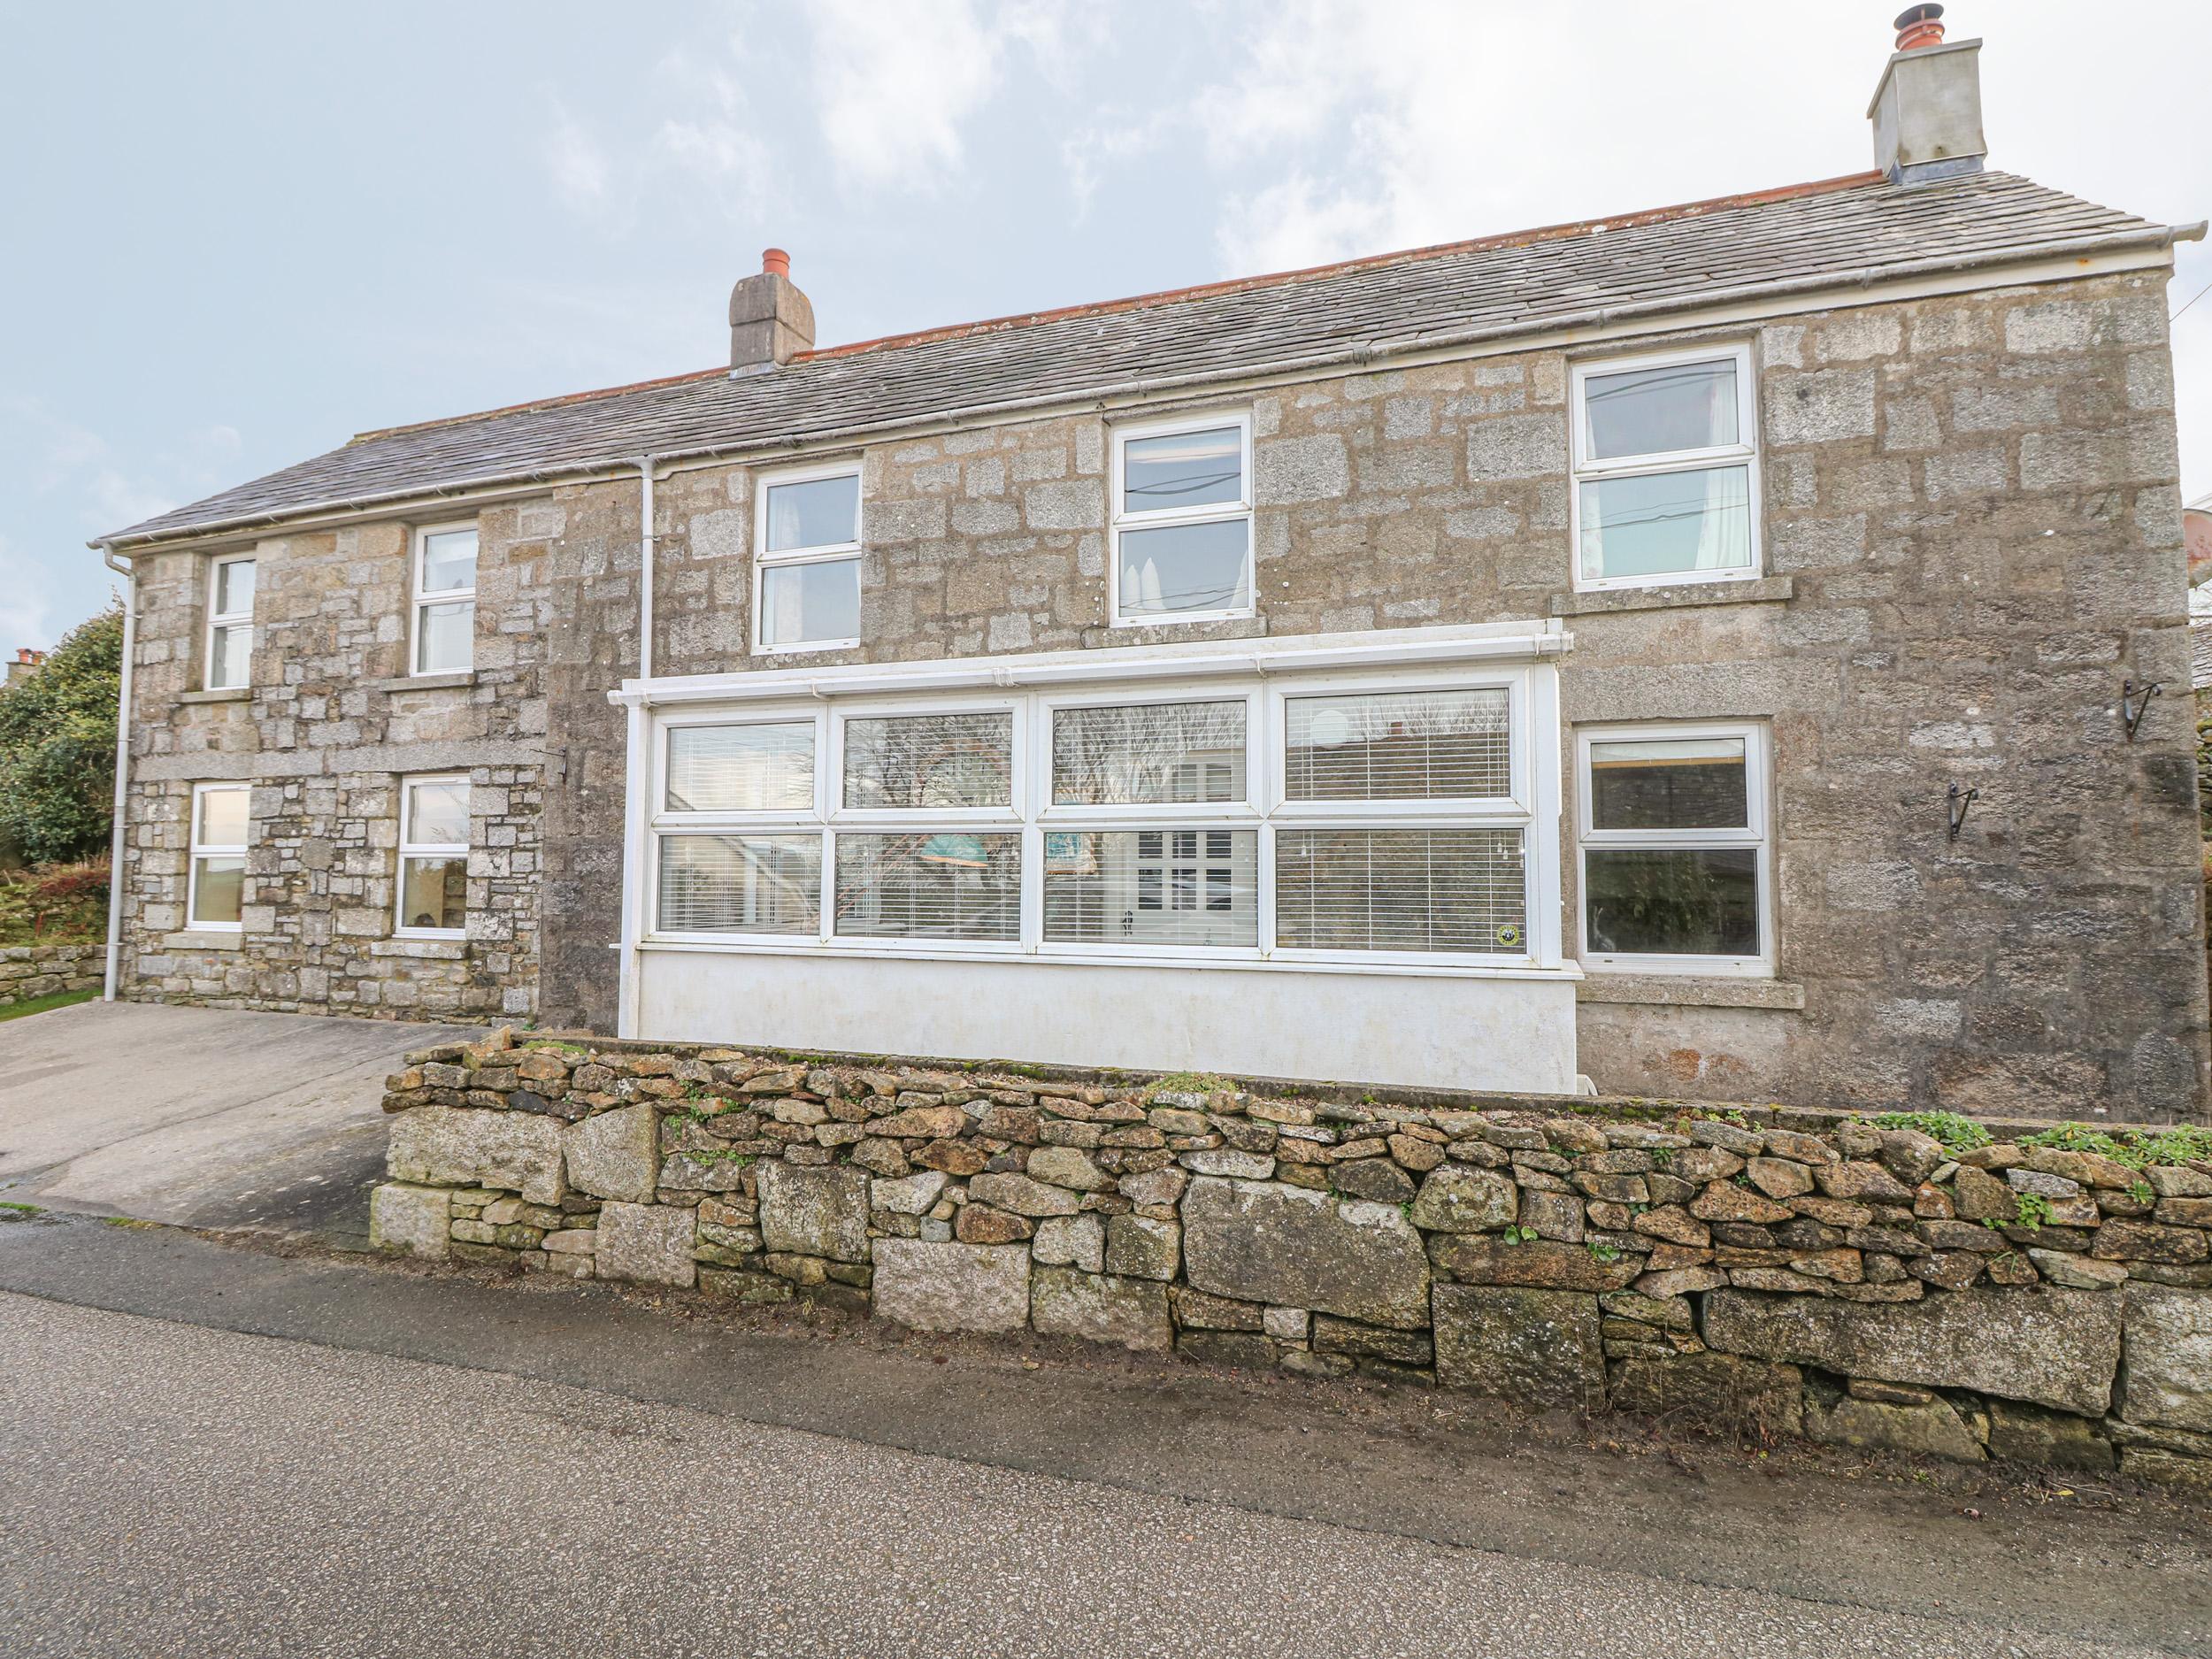 4 bedroom Cottage for rent in Bodmin